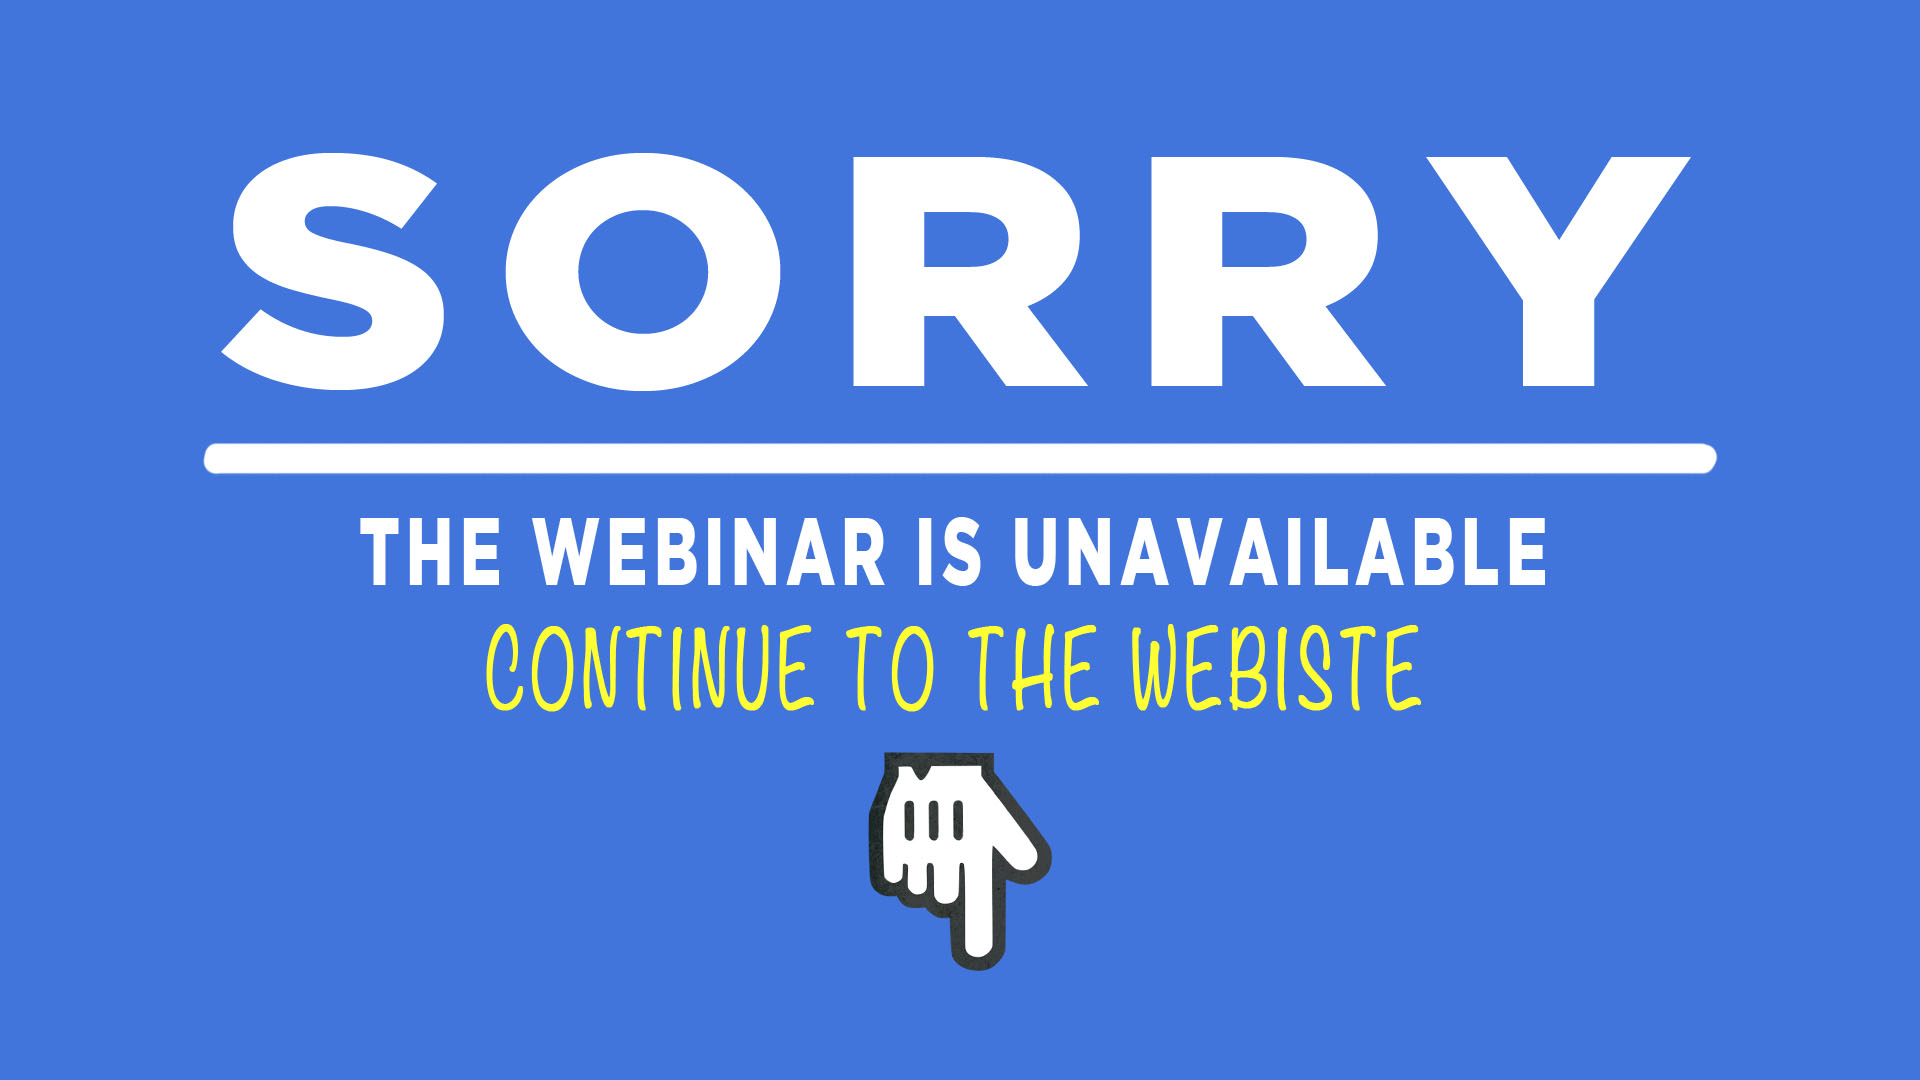 Sorry Webinar Is Unavailable